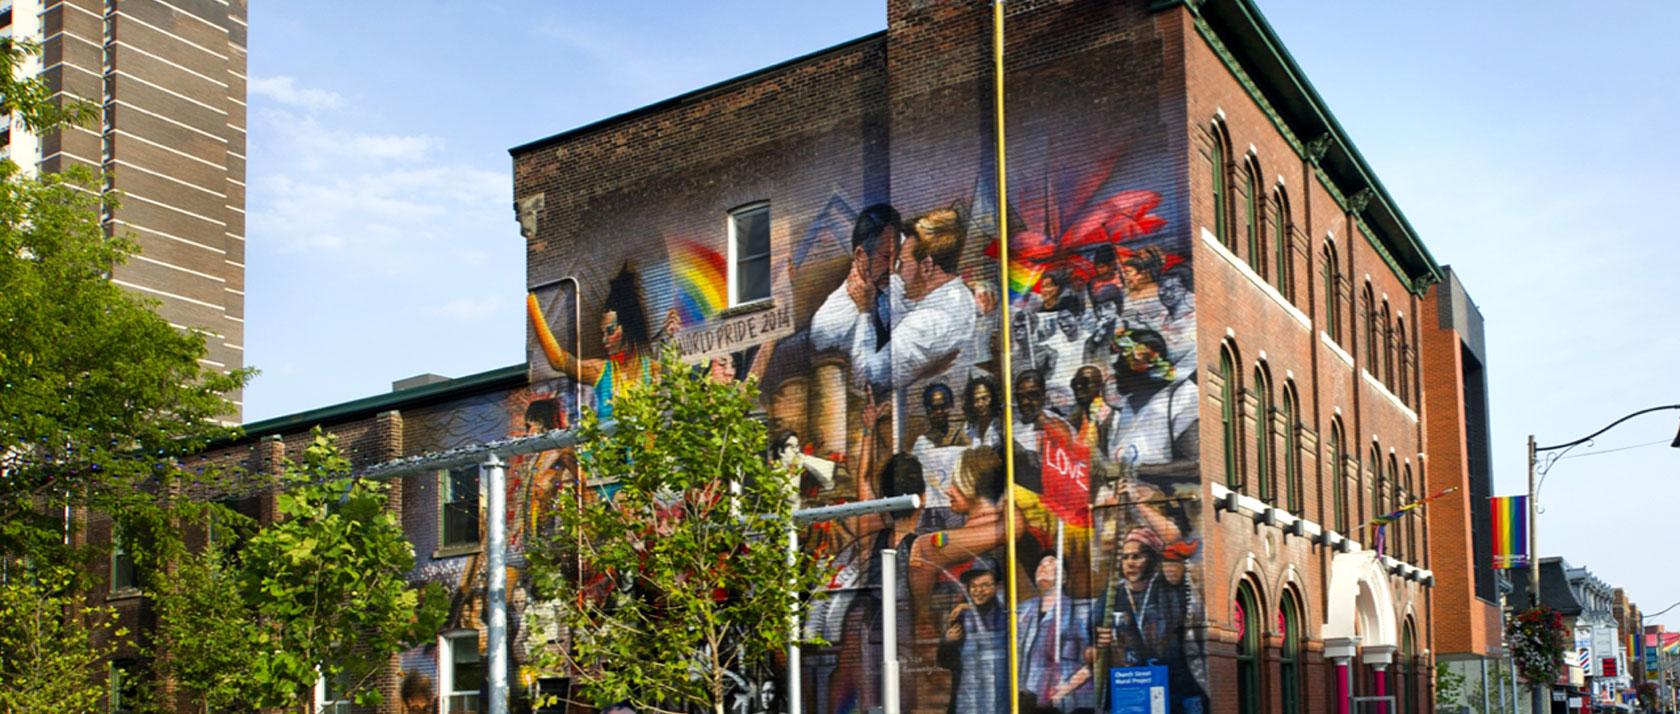 the-519-exterior-mural-luminato.jpg